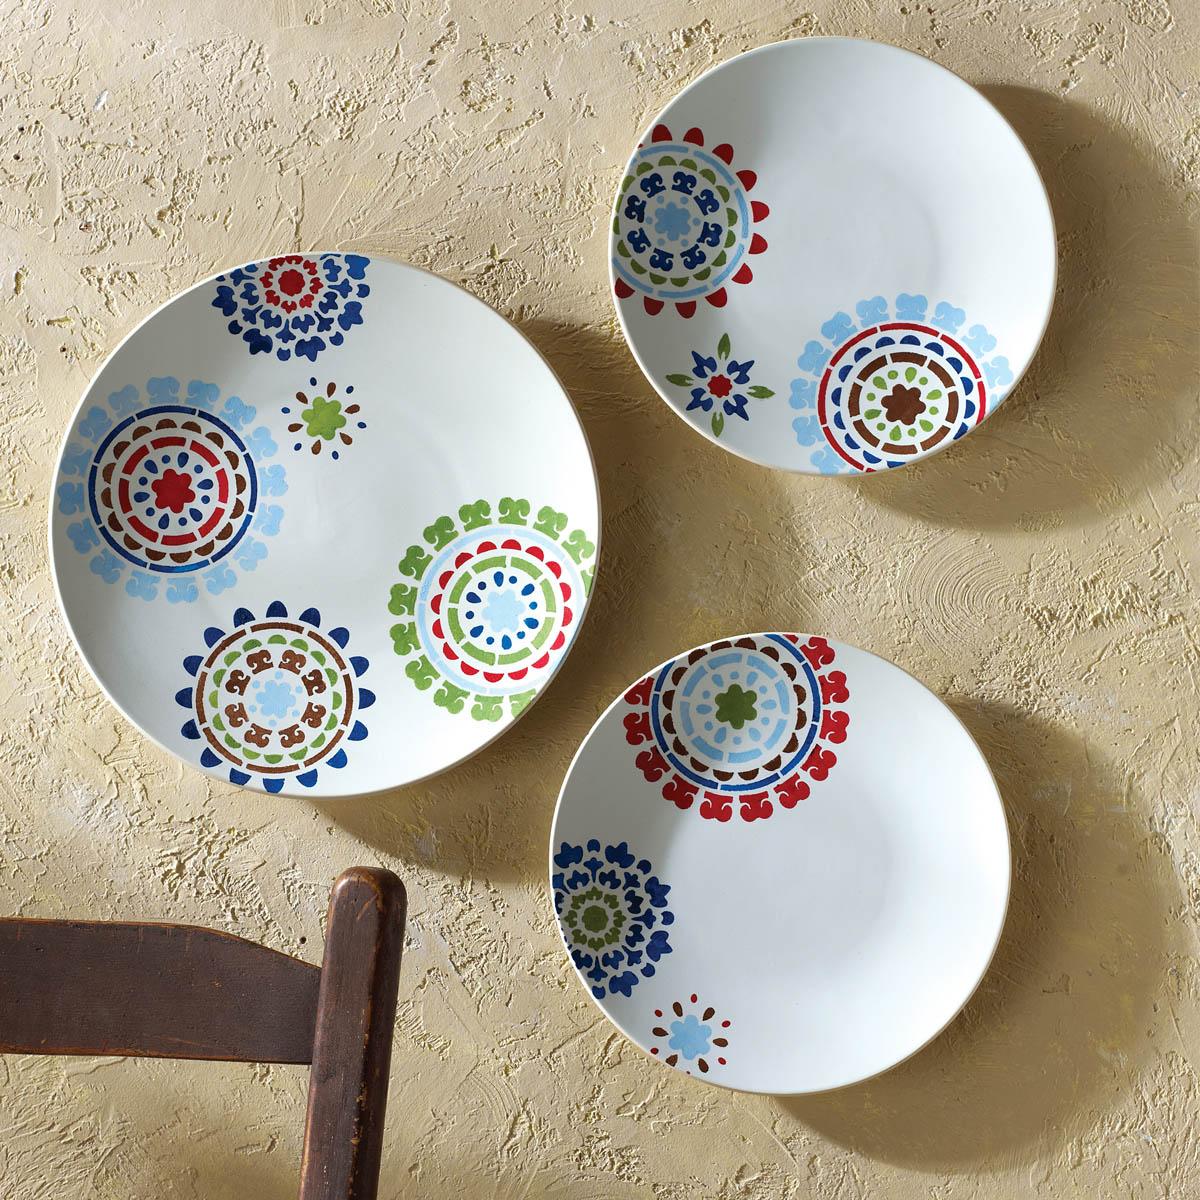 FolkArt ® Handmade Charlotte™ Stencils - Suzani Spendor - 30949